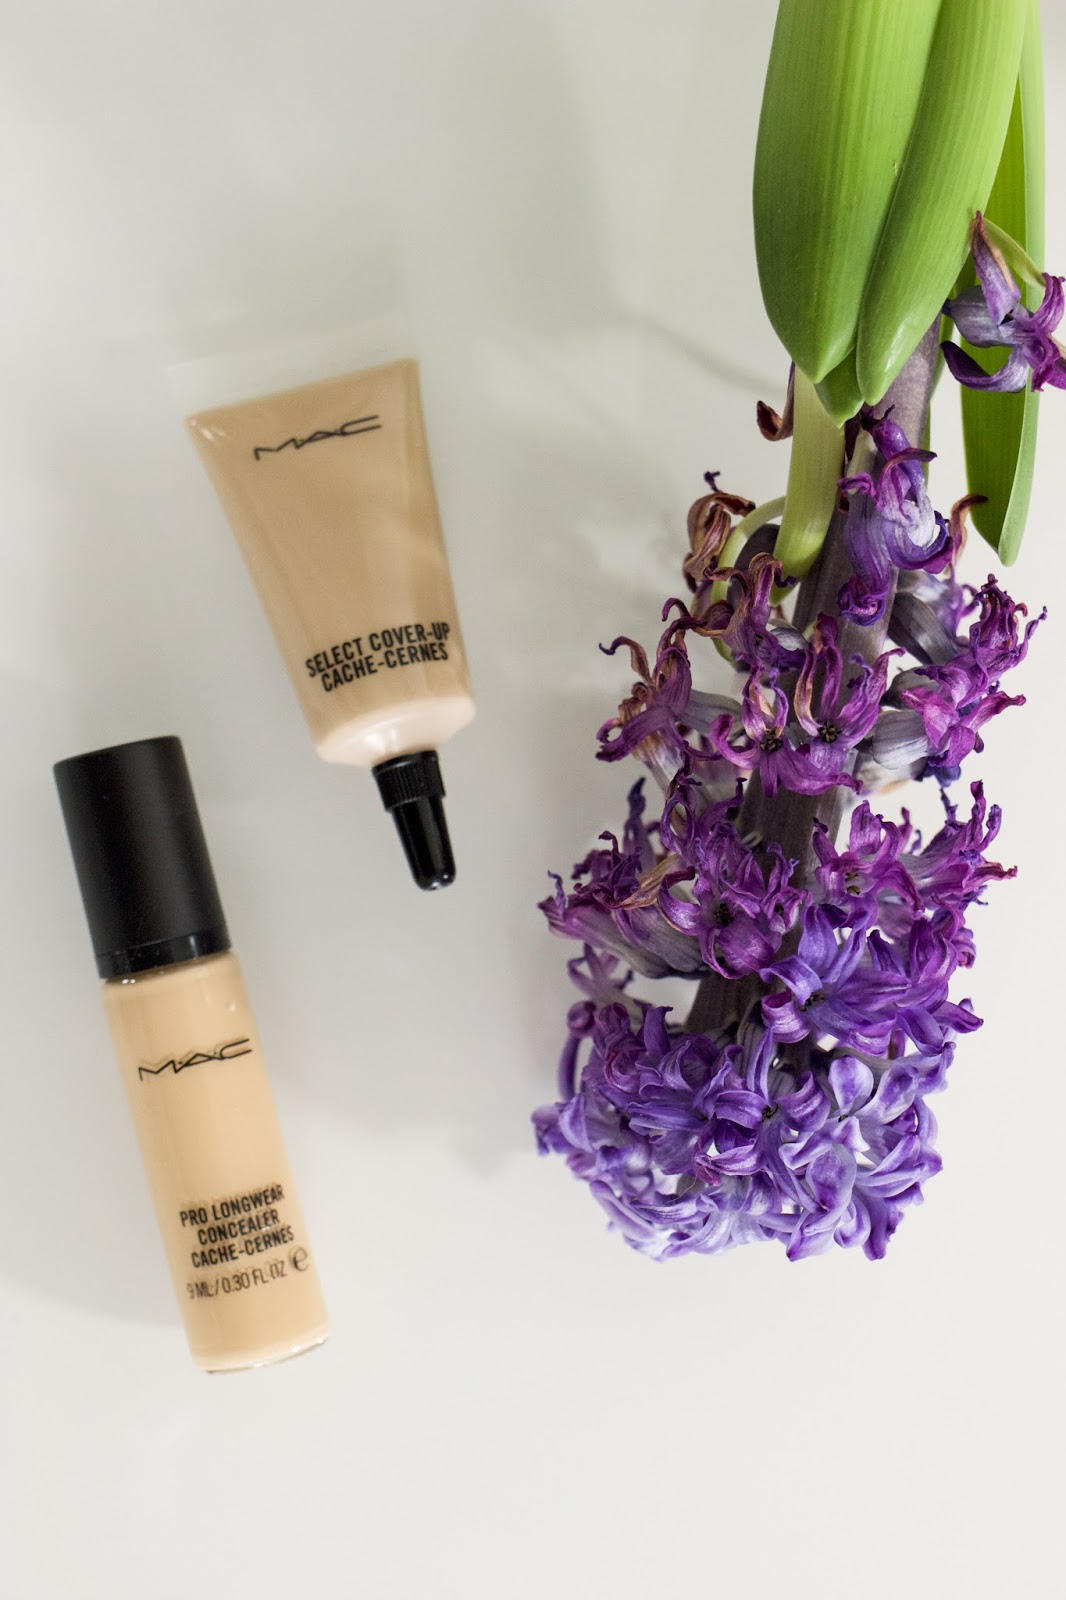 Mac cosmetics, Make Up, Pro longwear